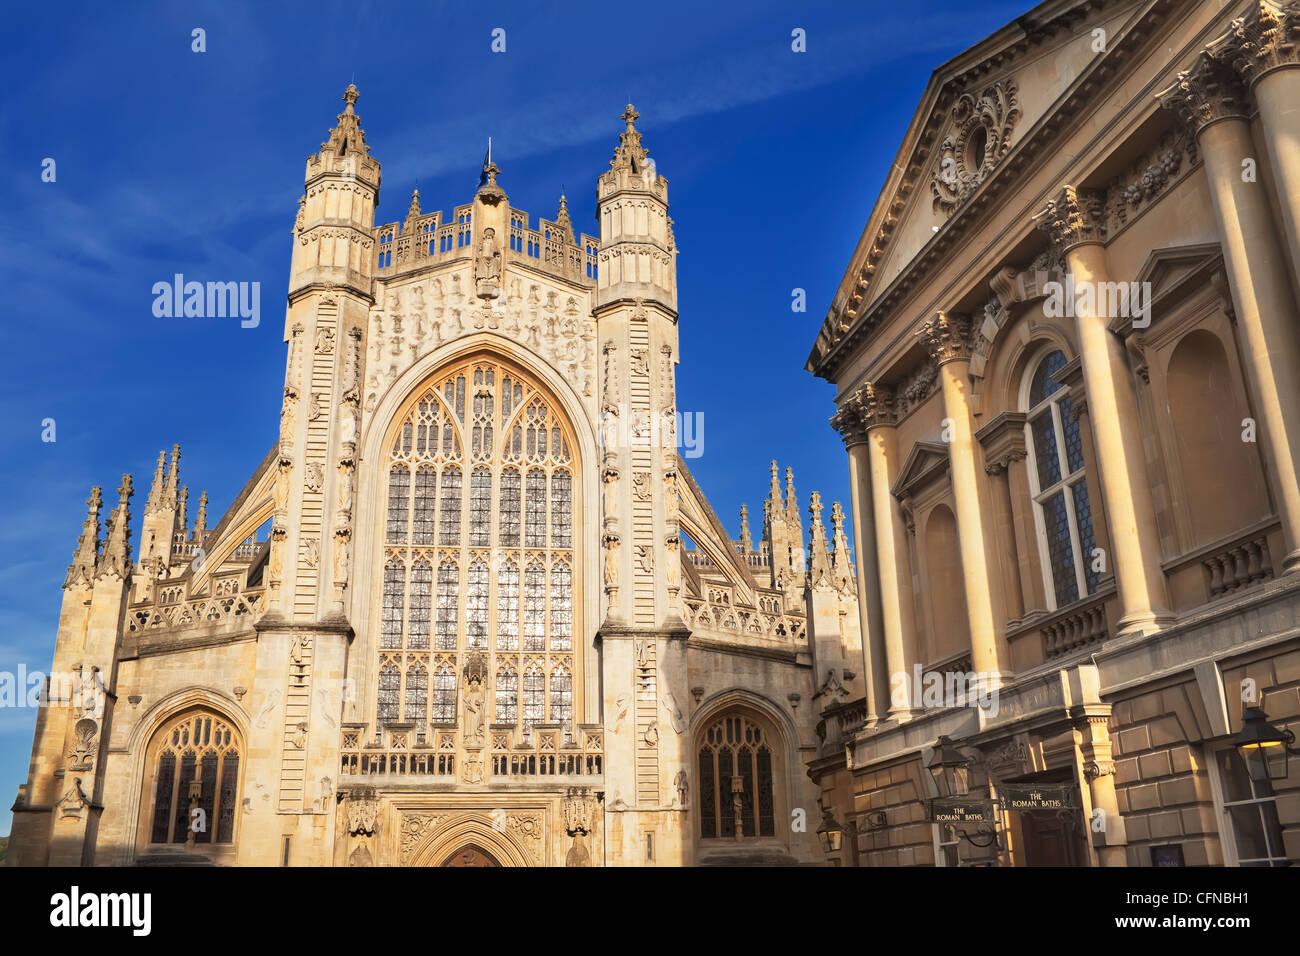 Bath Abbey and Roman Baths, Bath, UNESCO World Heritage Site, Somerset, England, United Kingdom, Europe - Stock Image